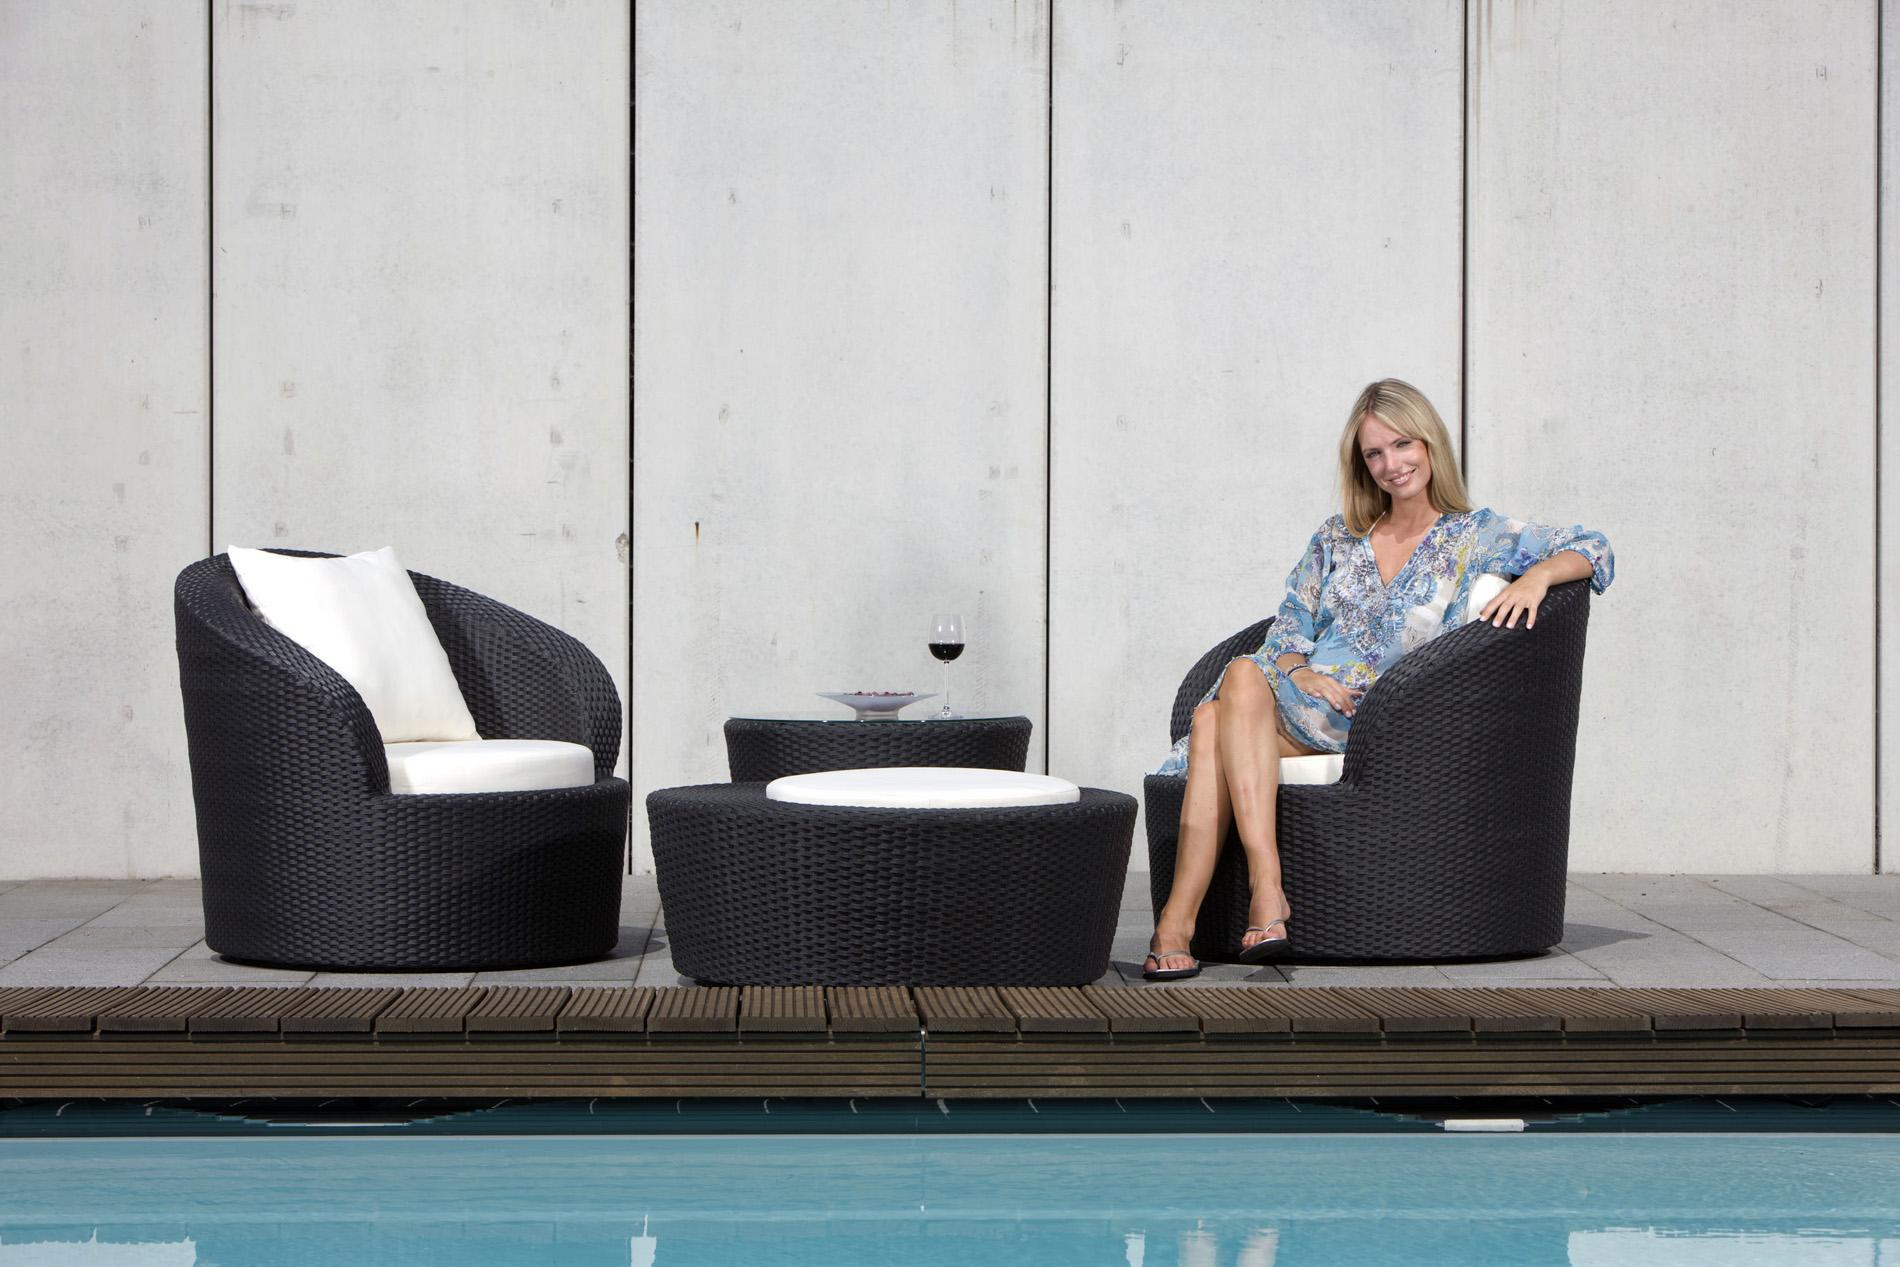 gartenm bel kaufen im online shop. Black Bedroom Furniture Sets. Home Design Ideas